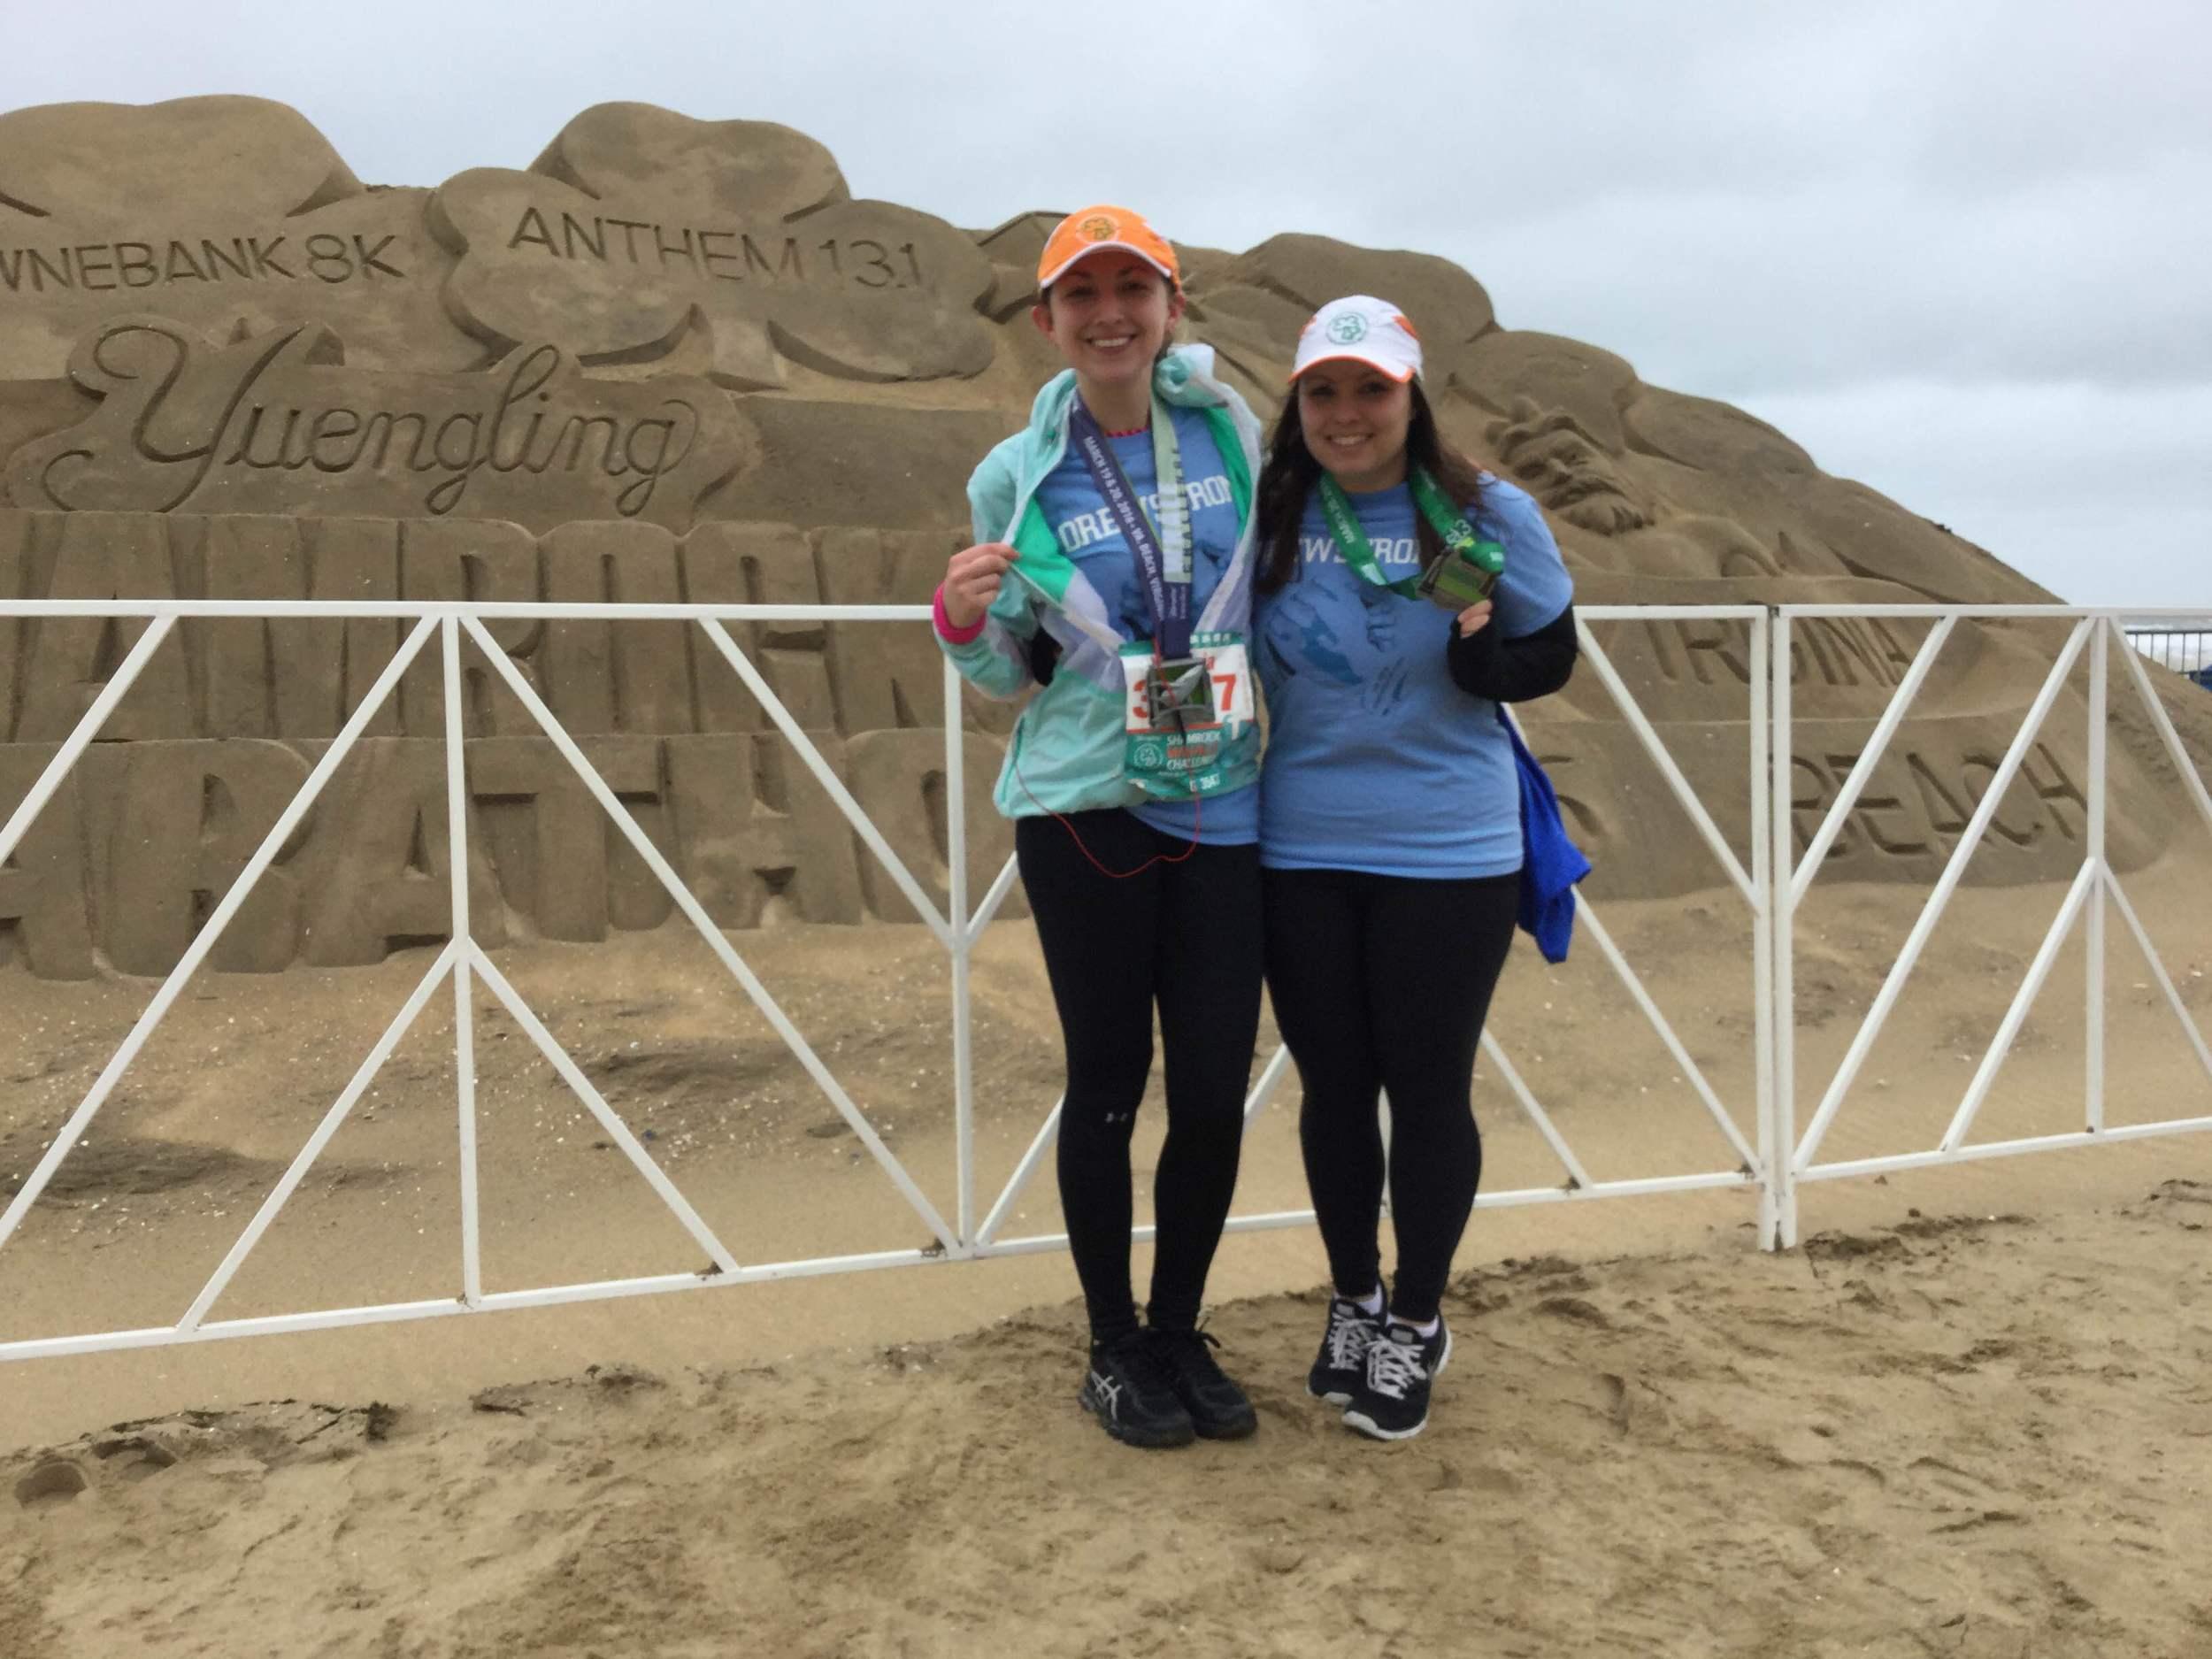 Torie Grice (left) and Tina Wyatt after their Shamrock Marathon run.